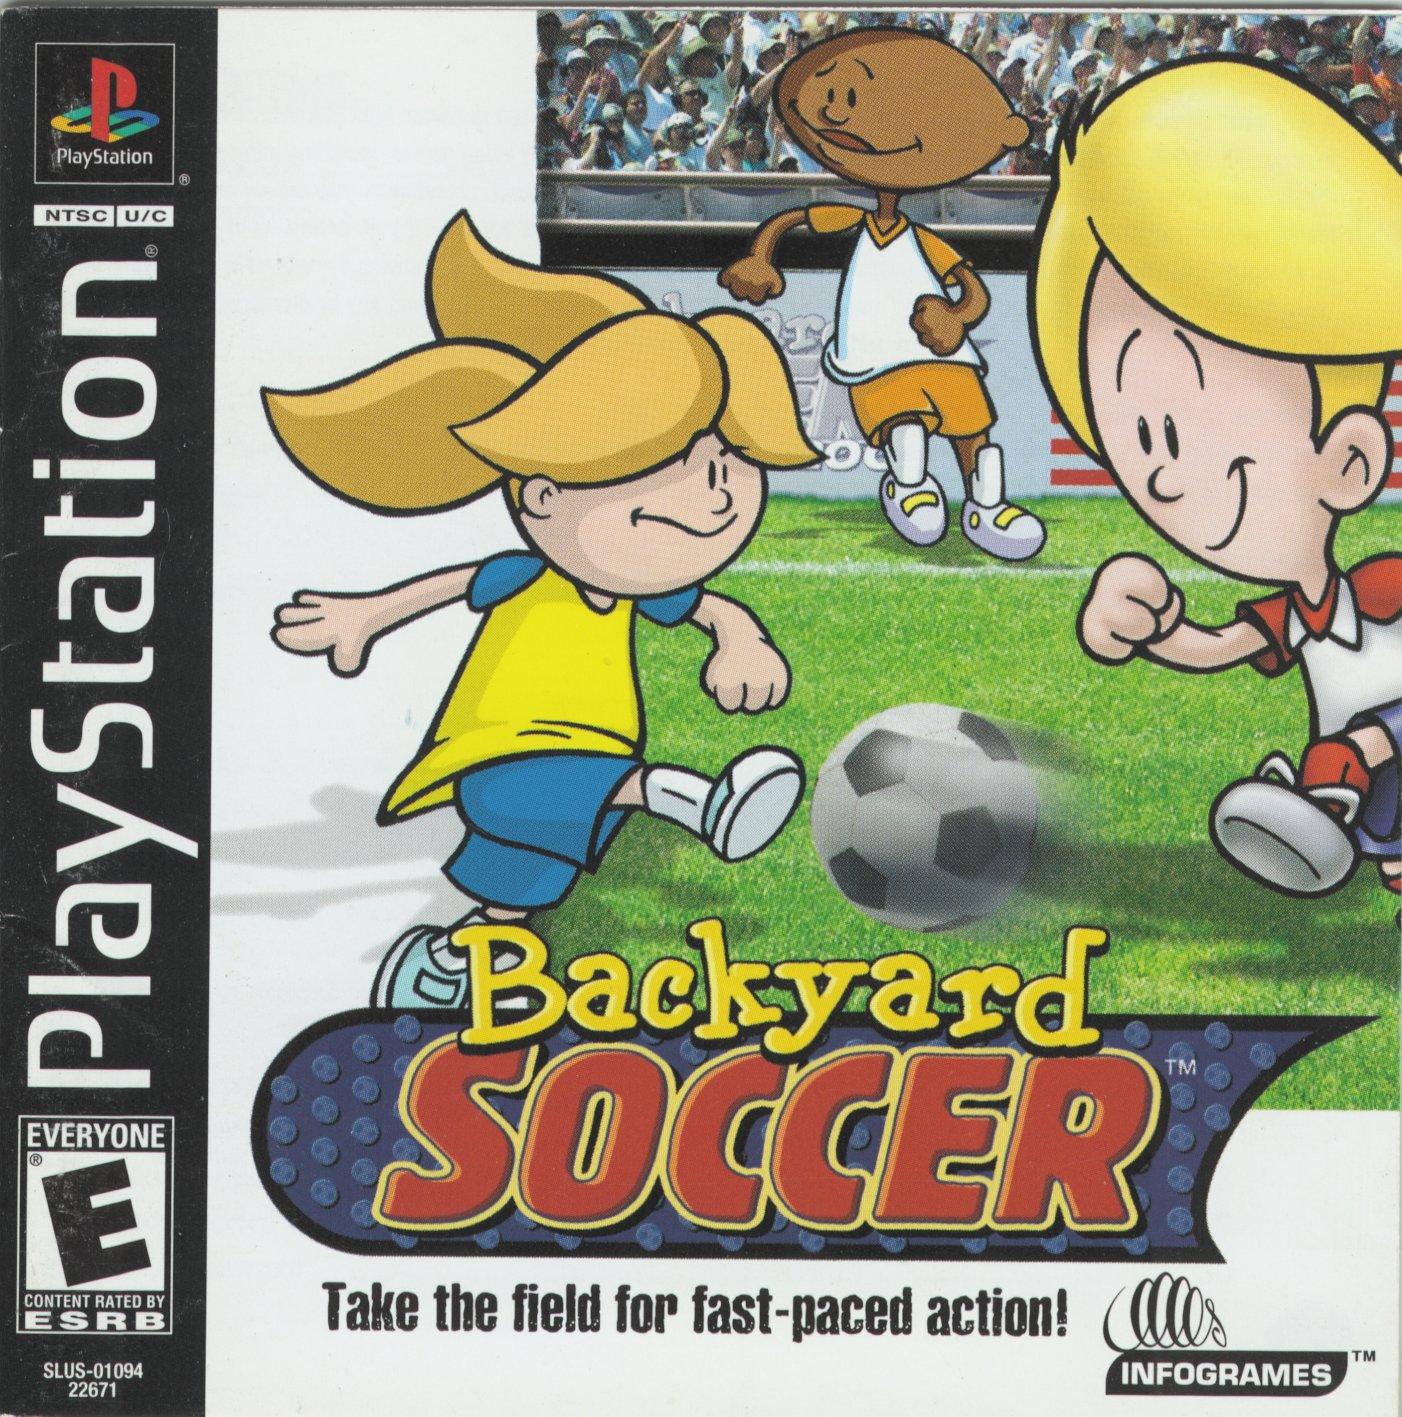 backyard soccer u iso download